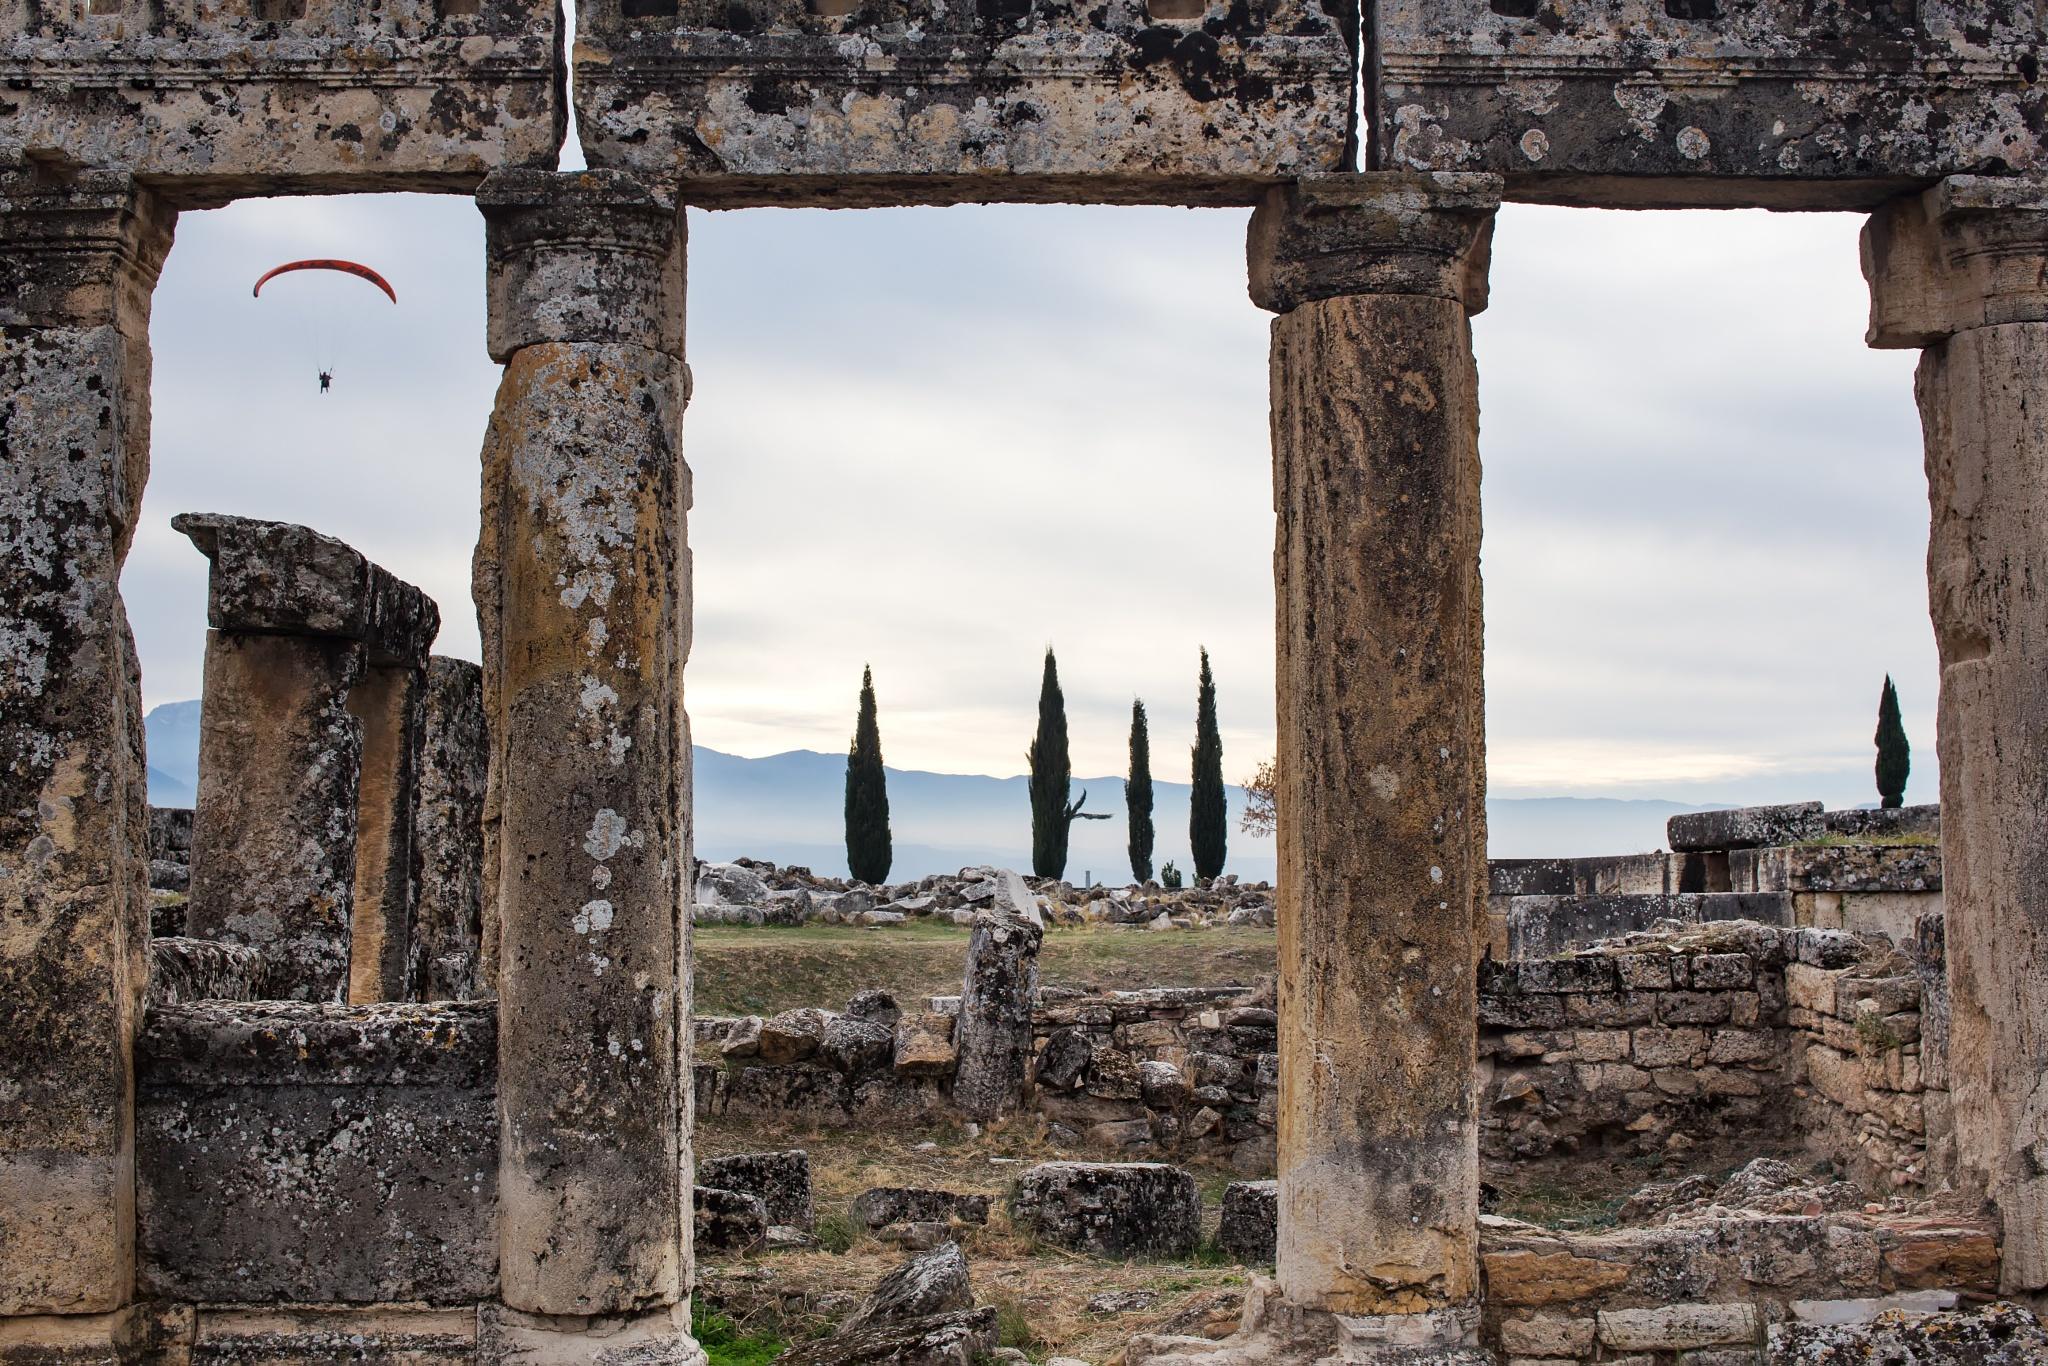 Flight over Hierapolis by Lothar Bendix